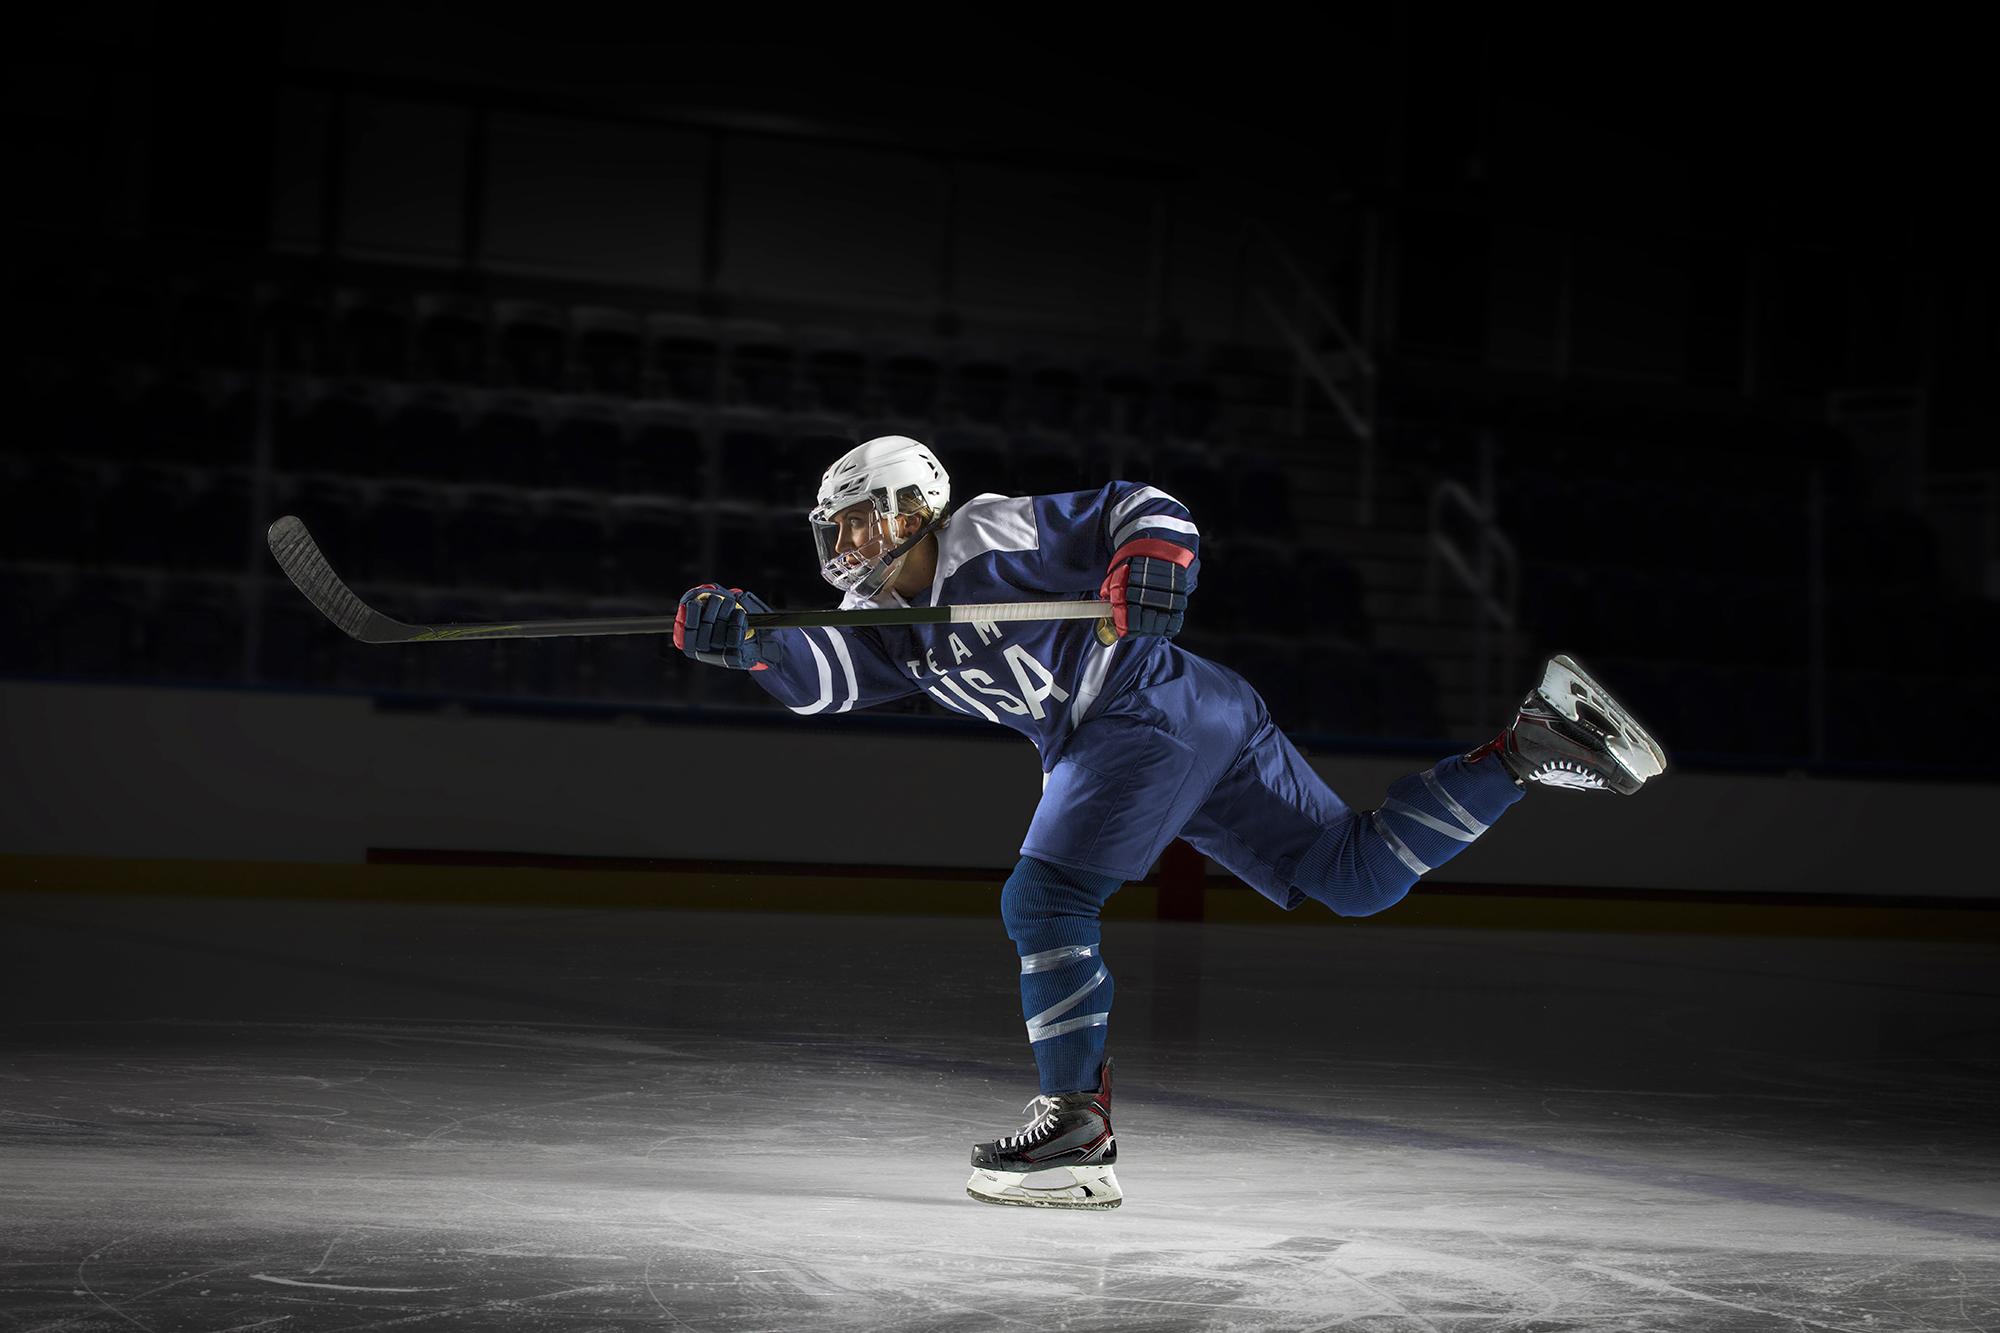 P&G – Olympic Athlete